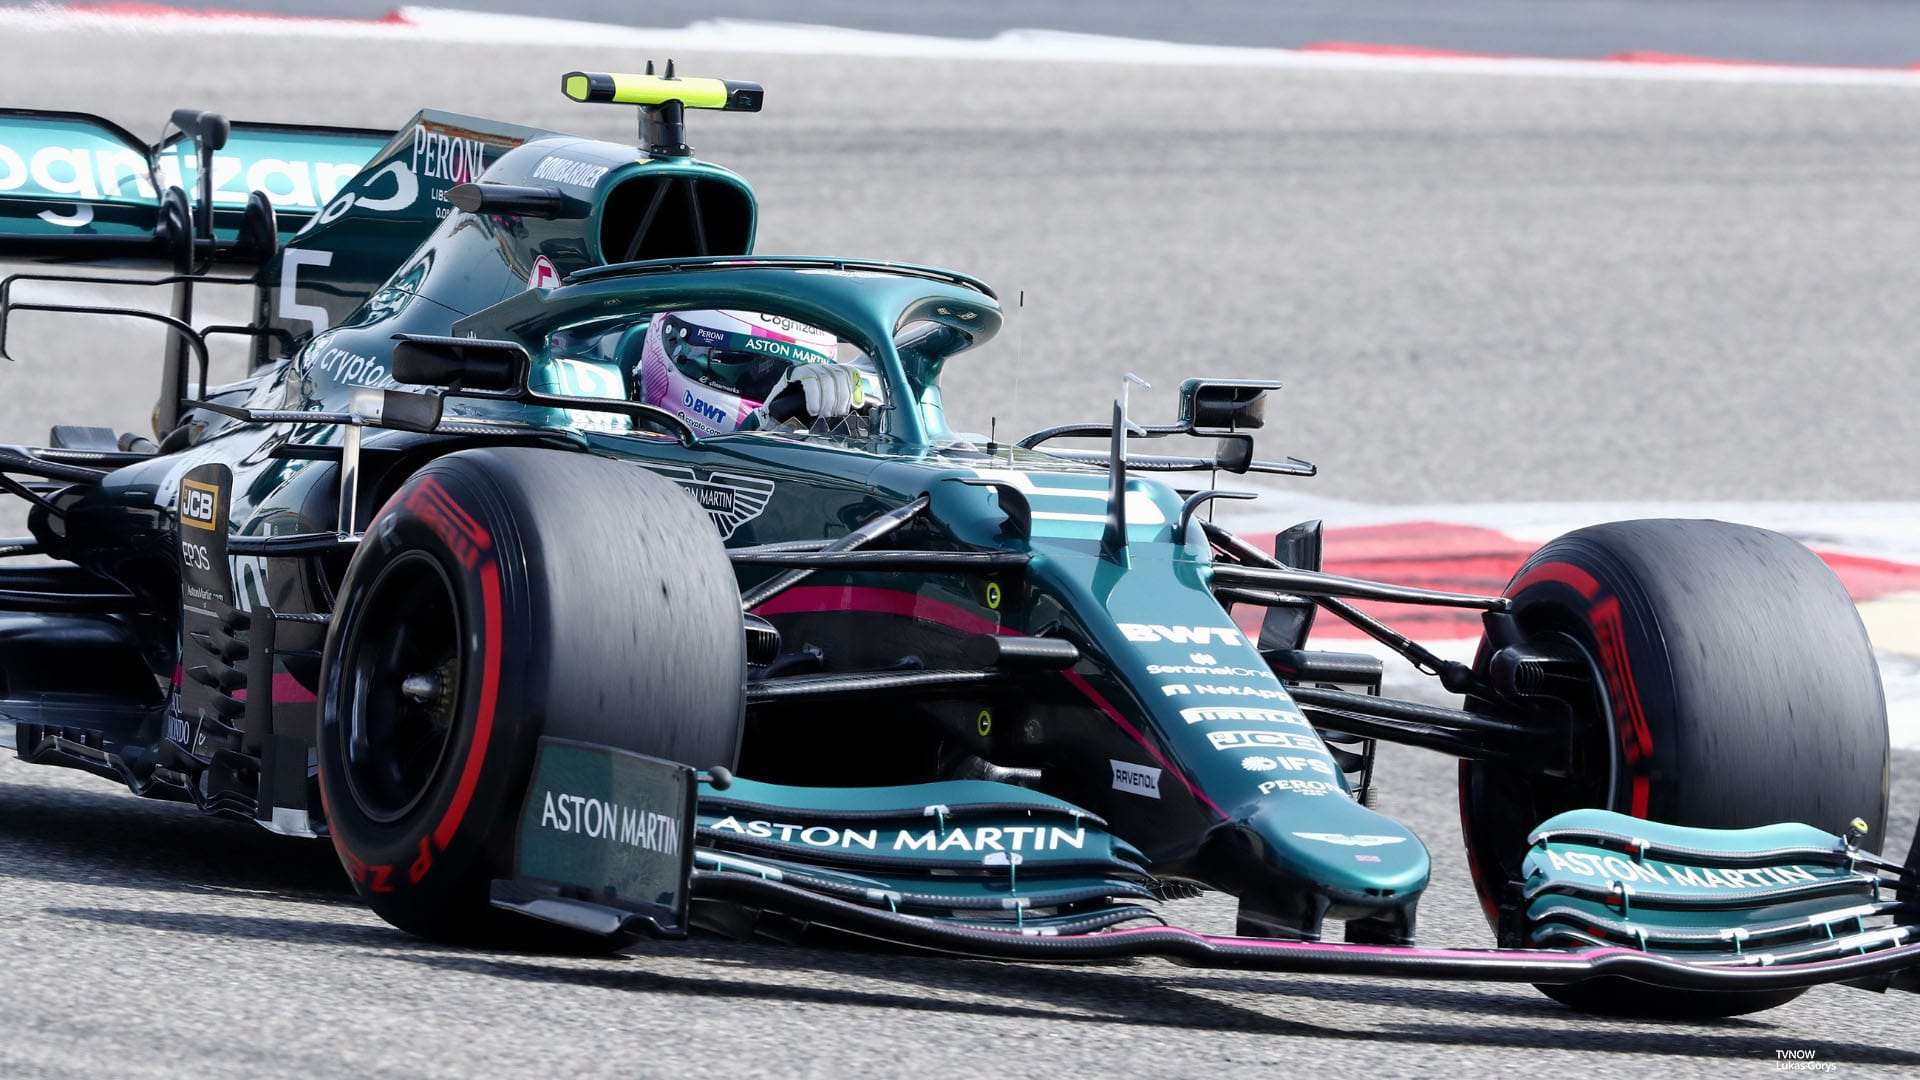 Sebastian Vettel fährt im Formel 1 Auto von Aston Martin.